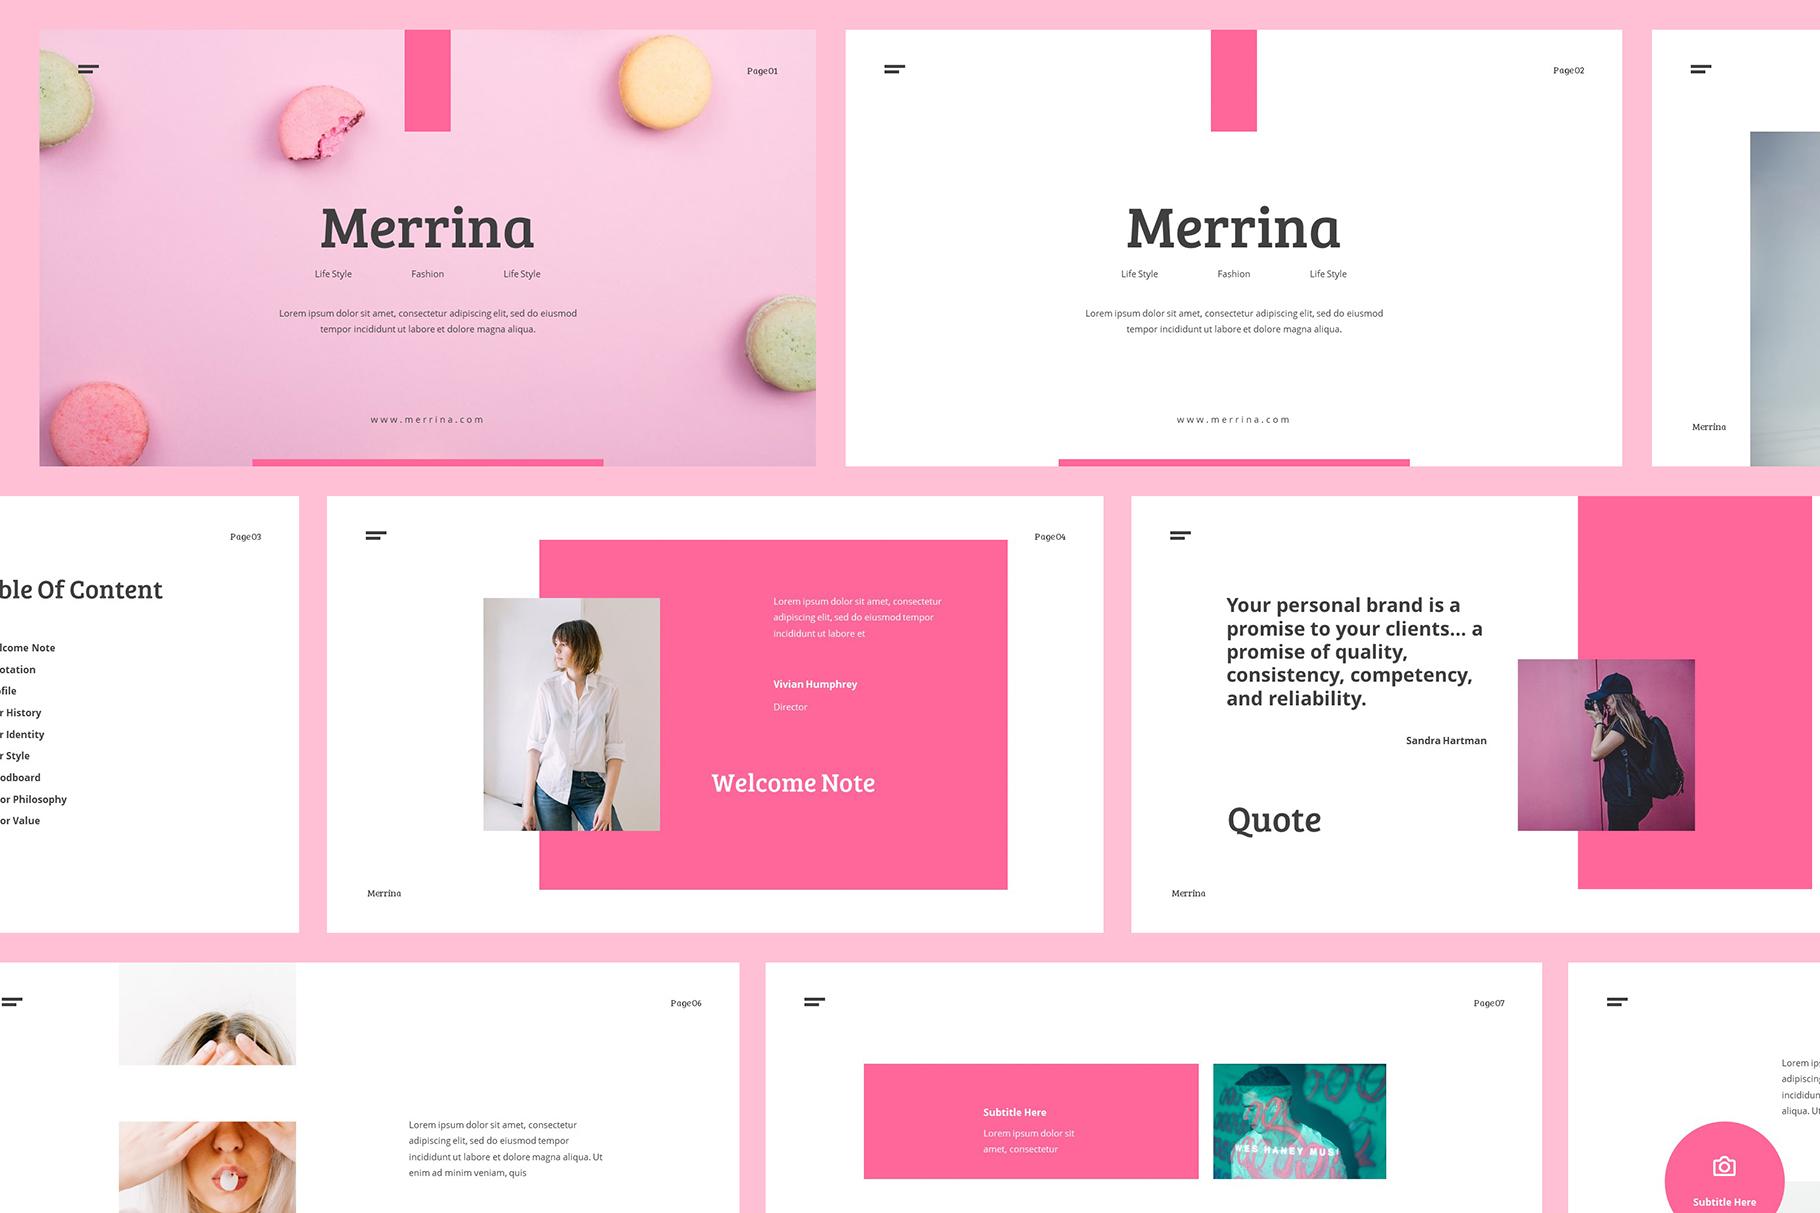 Merrina - Brand Guideline Keynote example image 2